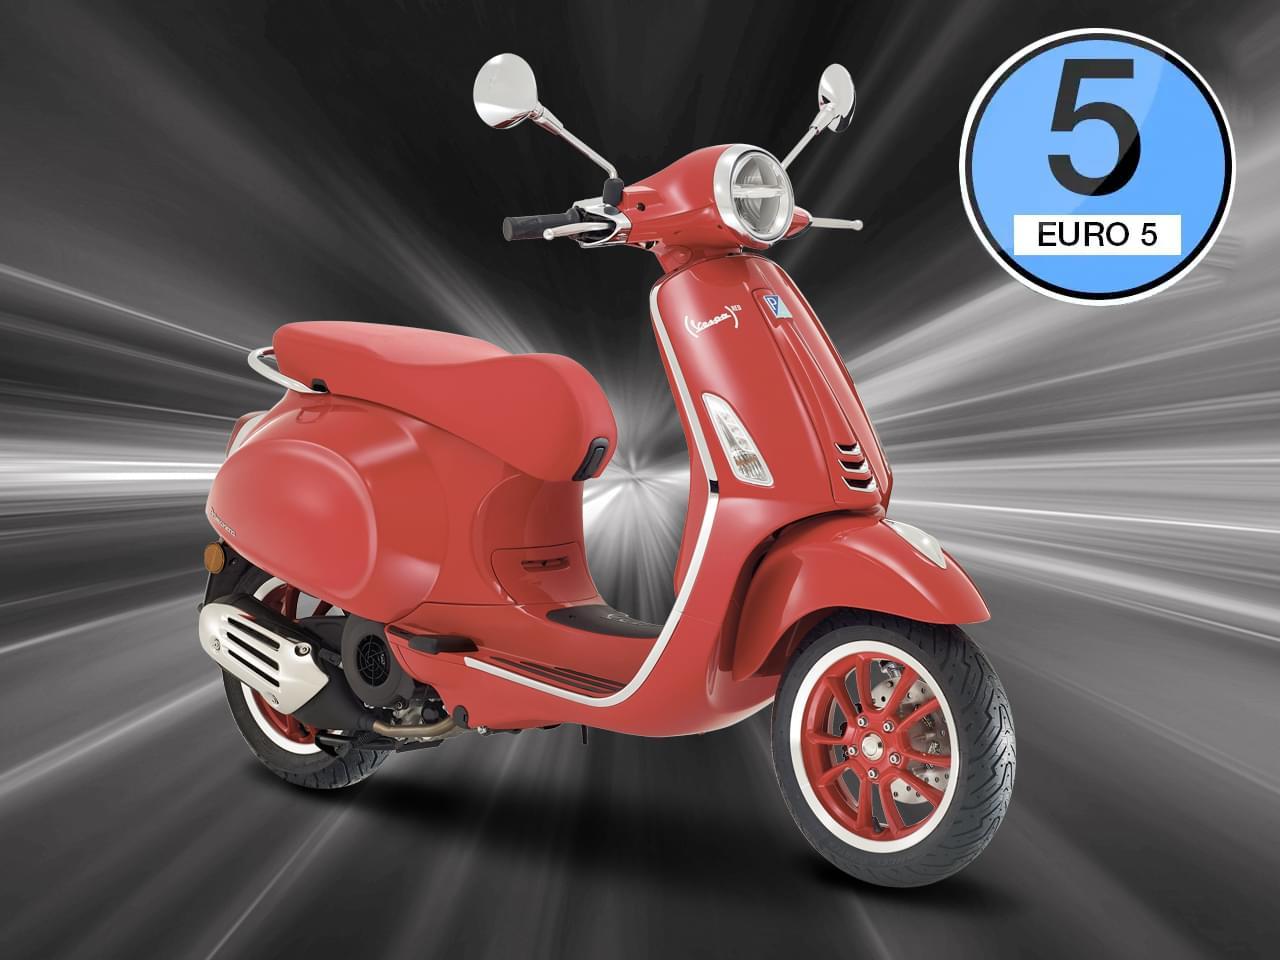 Vespa Primavera Product RED 125 3V i-get ABS - Modell 2021